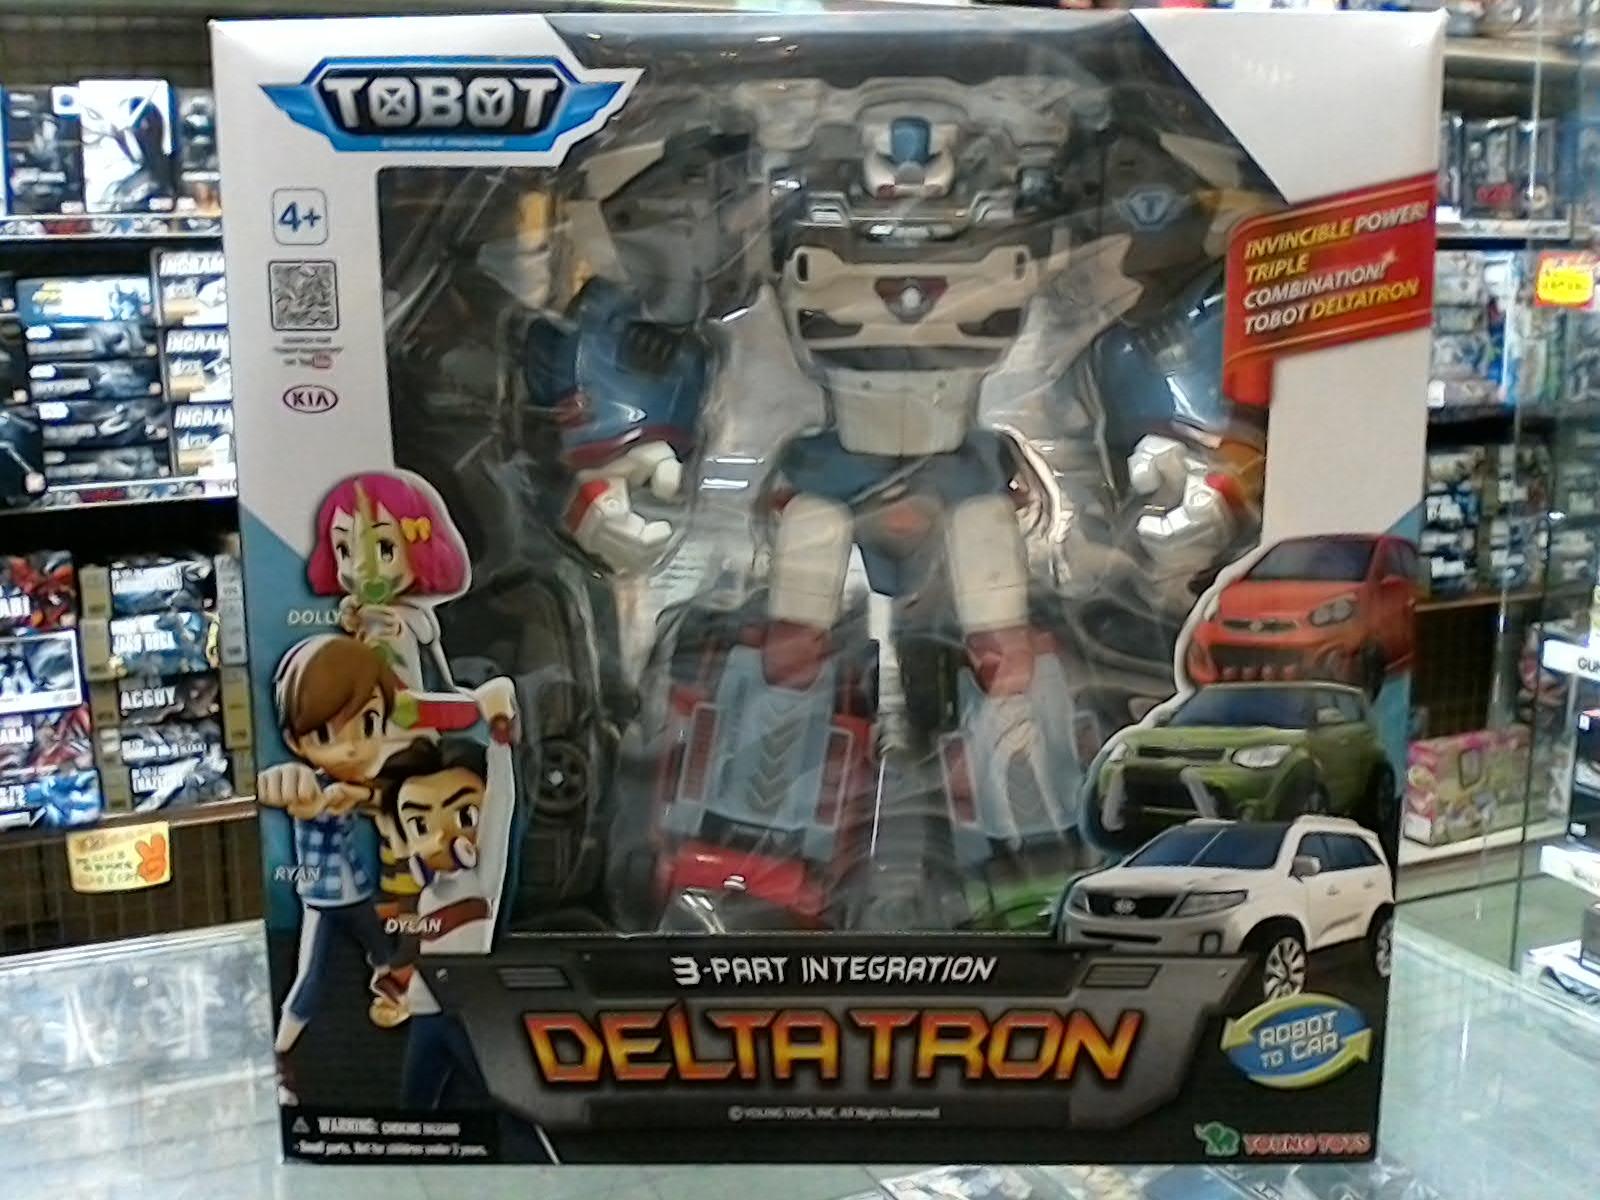 機器戰士TOBOT  DELTA TRON 3機合體